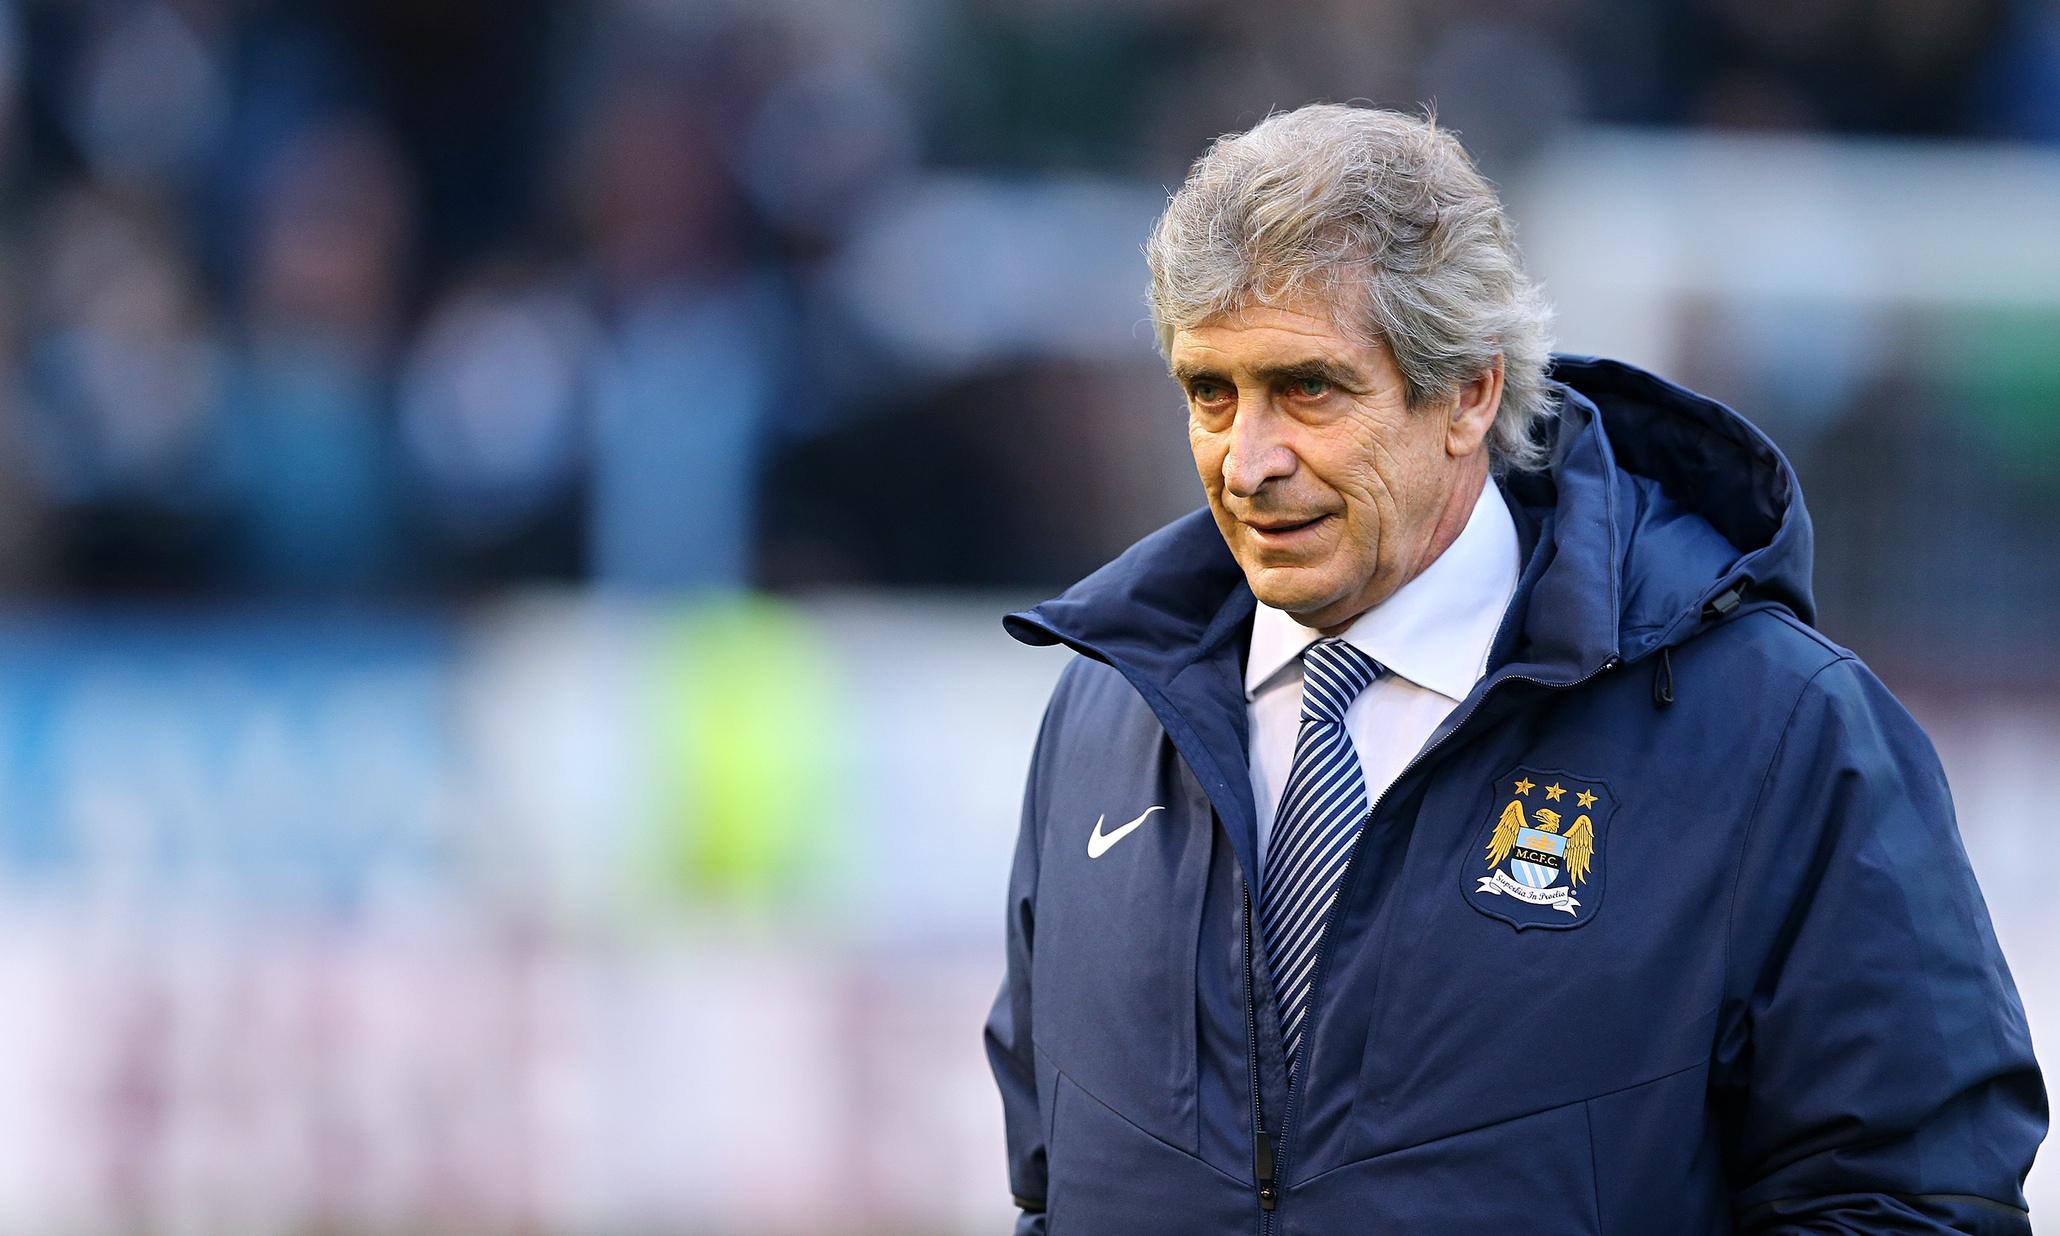 Manuel-Pellegrini-Burnley-Manchester City